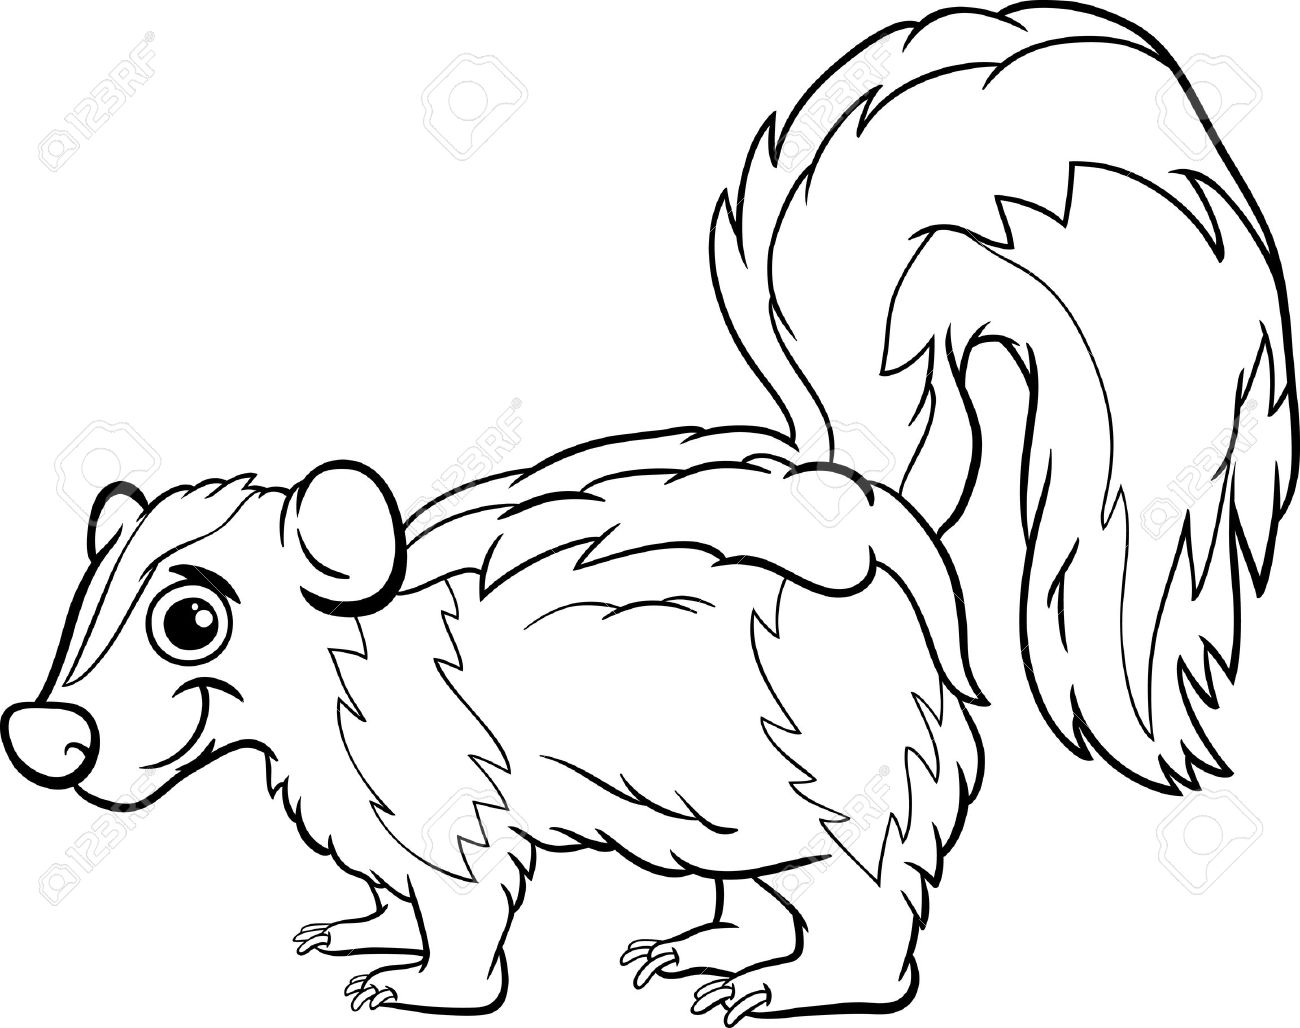 Dibujo De Animales Para Colorear. Stunning Dibujos Siluetas De ...